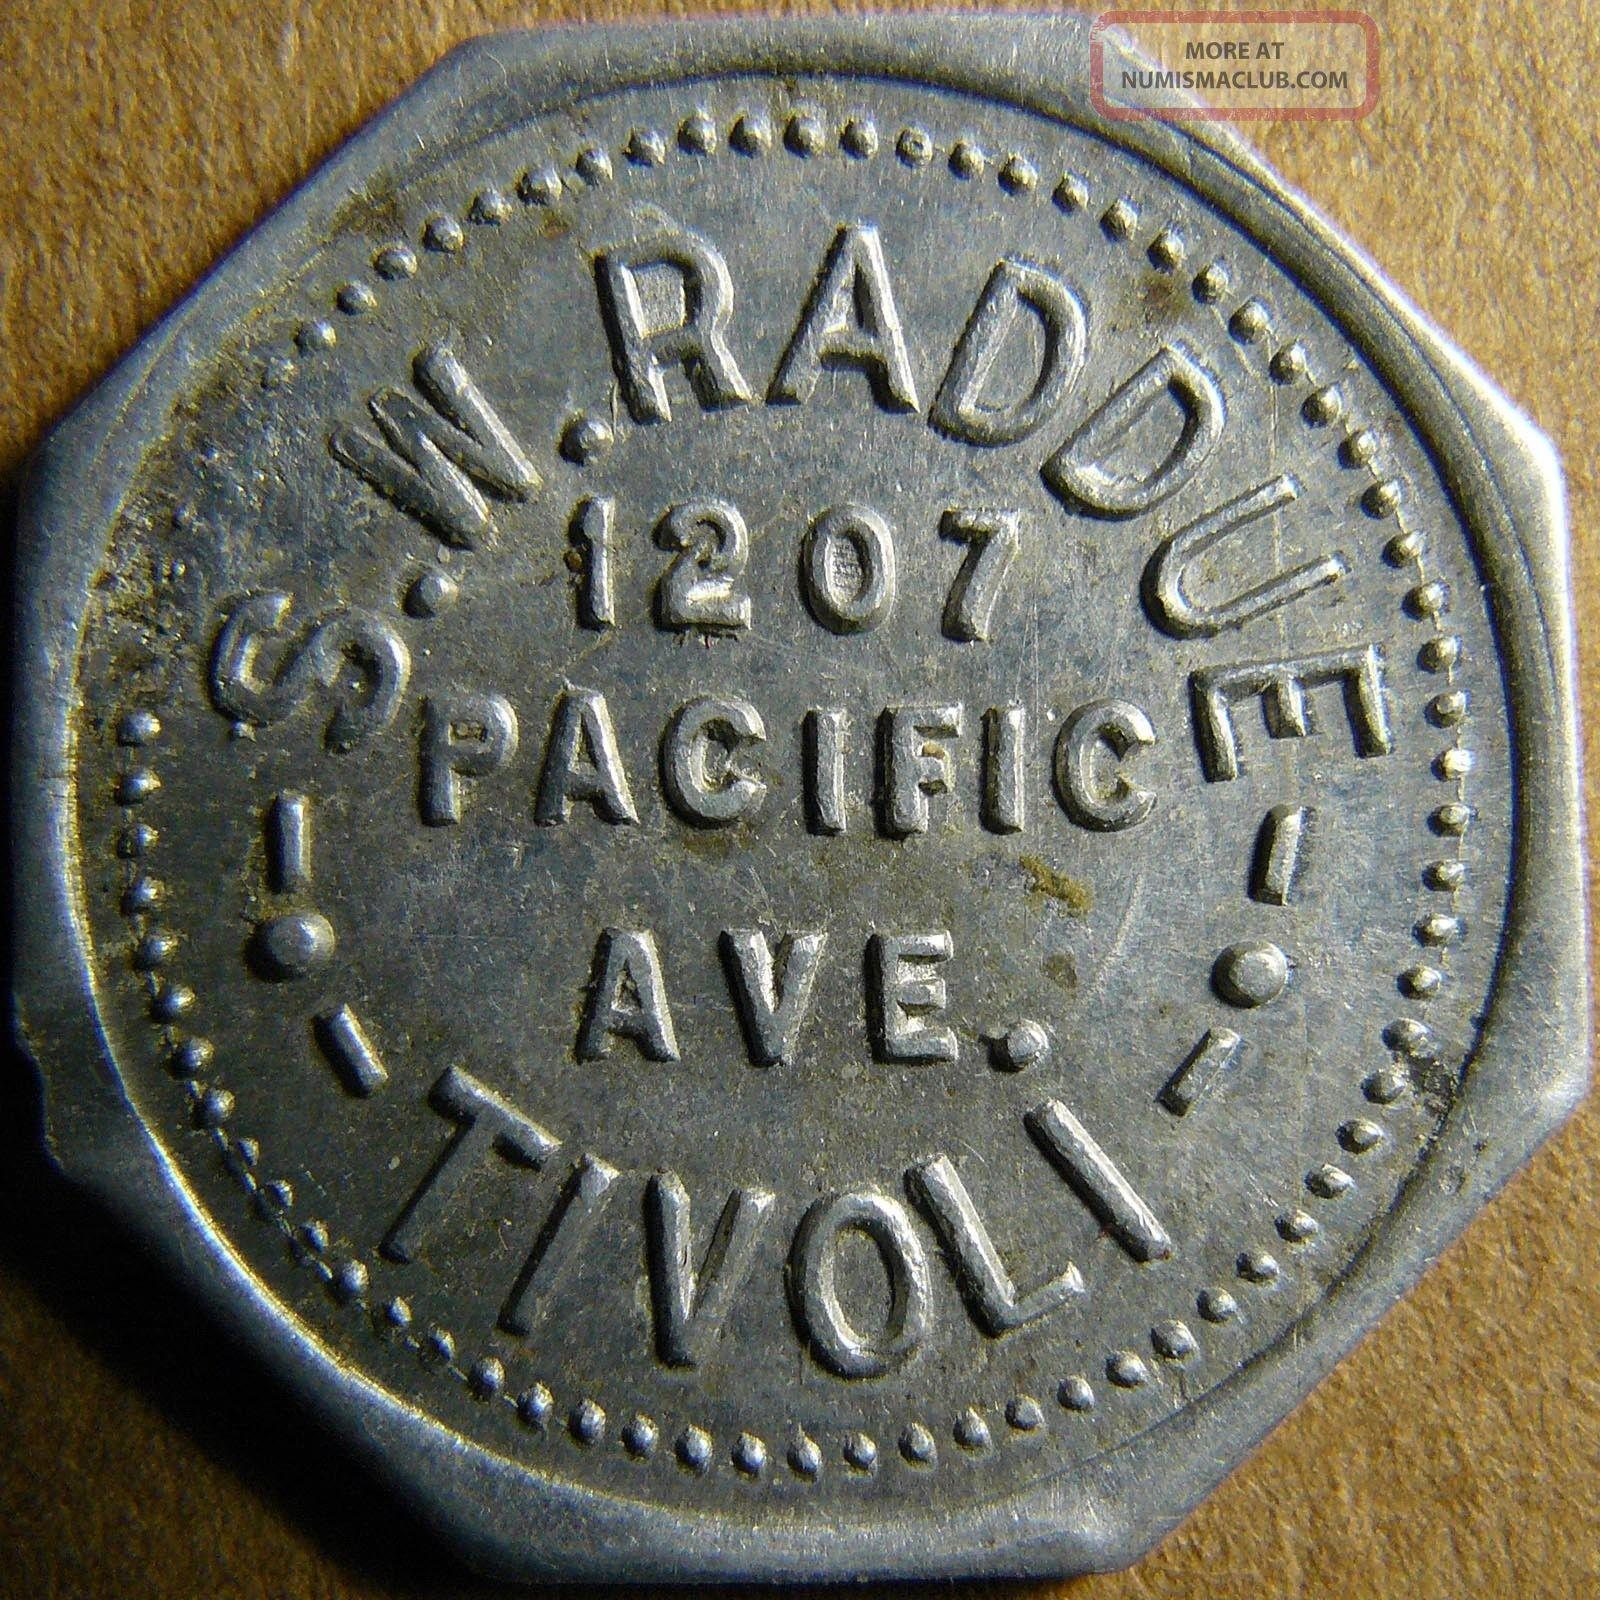 Tacoma Washington Tivoli - S.  W.  Raddue 5c Good For Token Exonumia photo